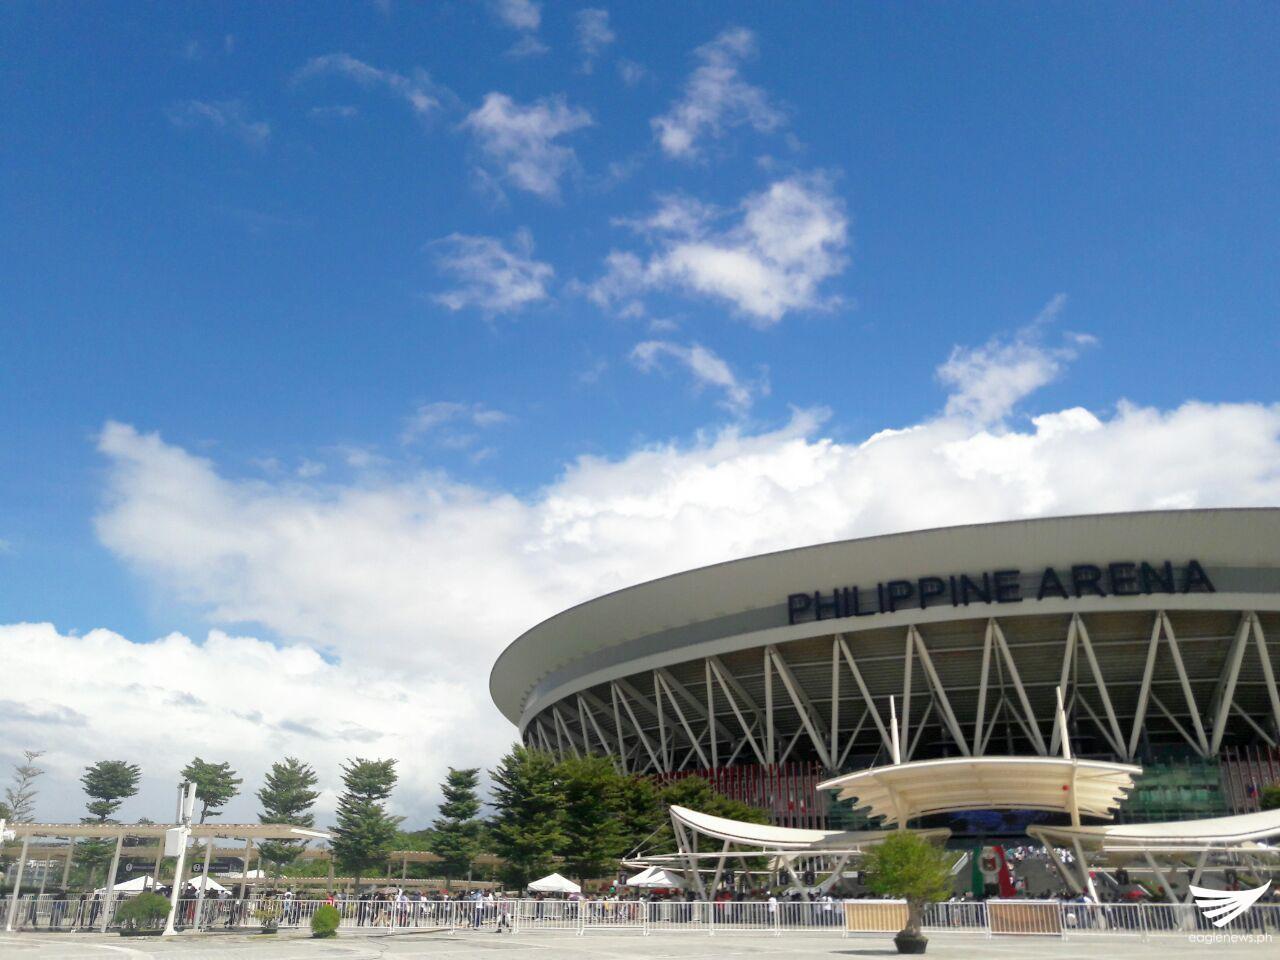 philippine-arena00001